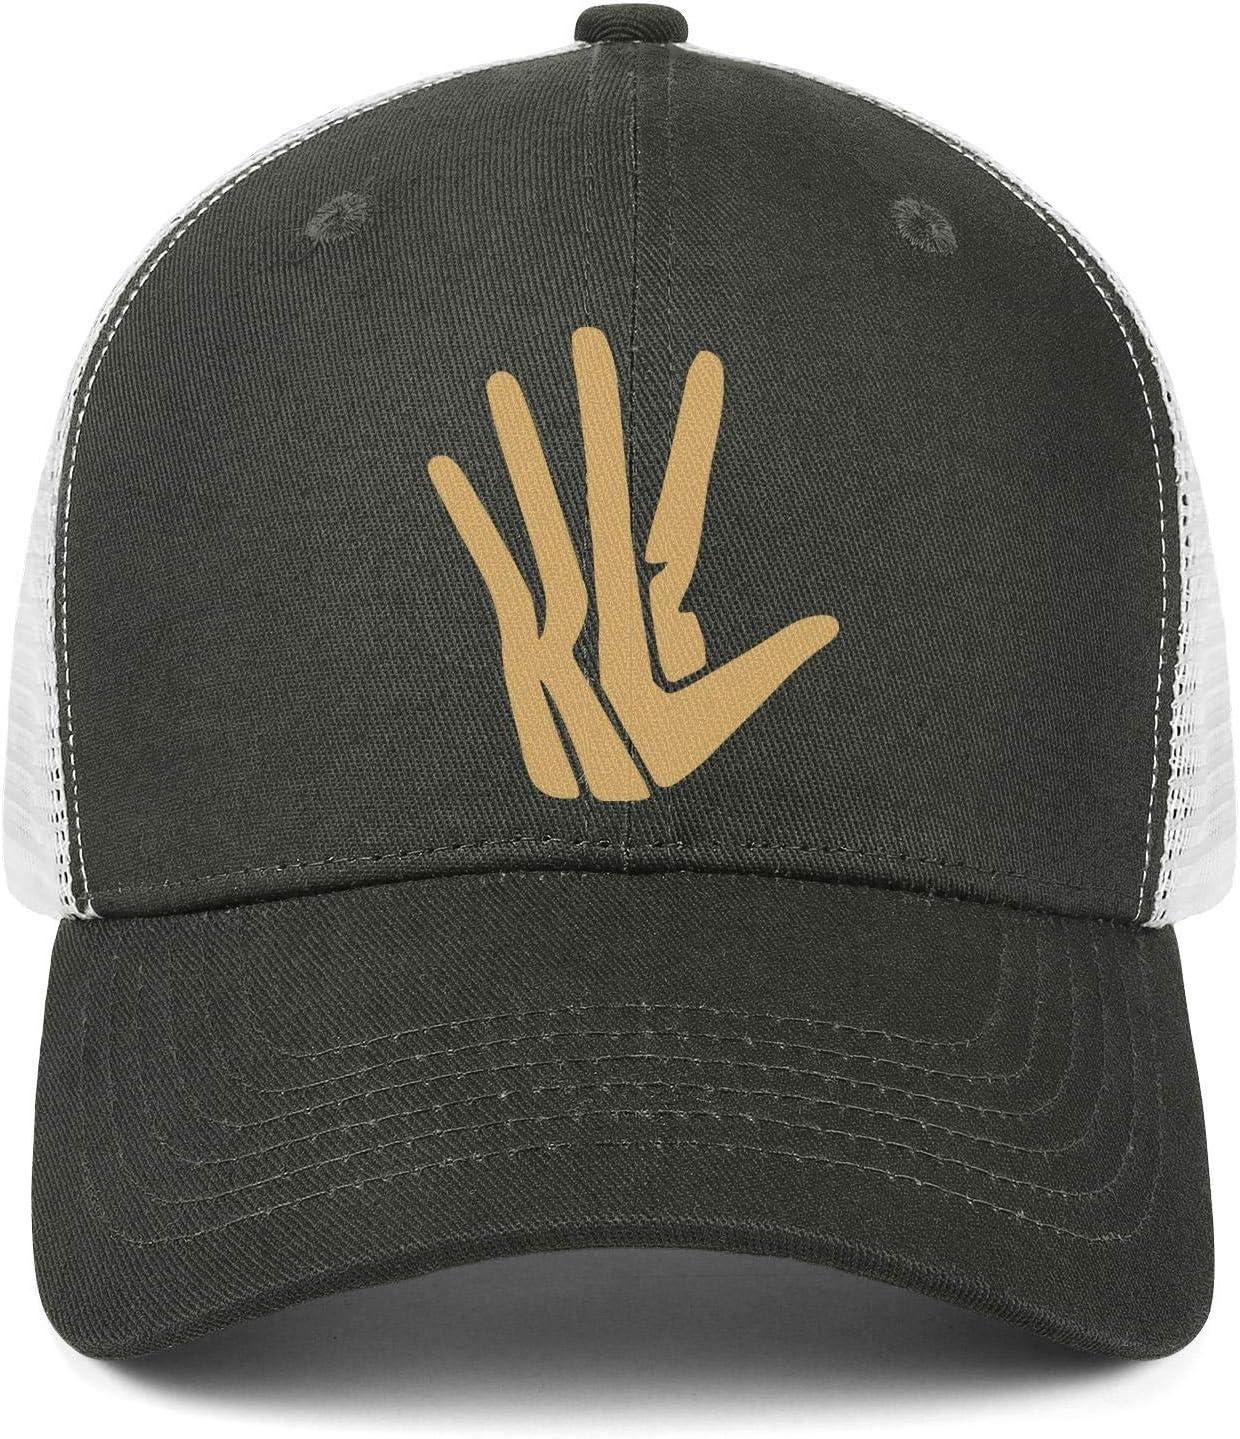 ZOENA Mercedes Benz Logo Hip-Hop Cotton Hats Running Caps White